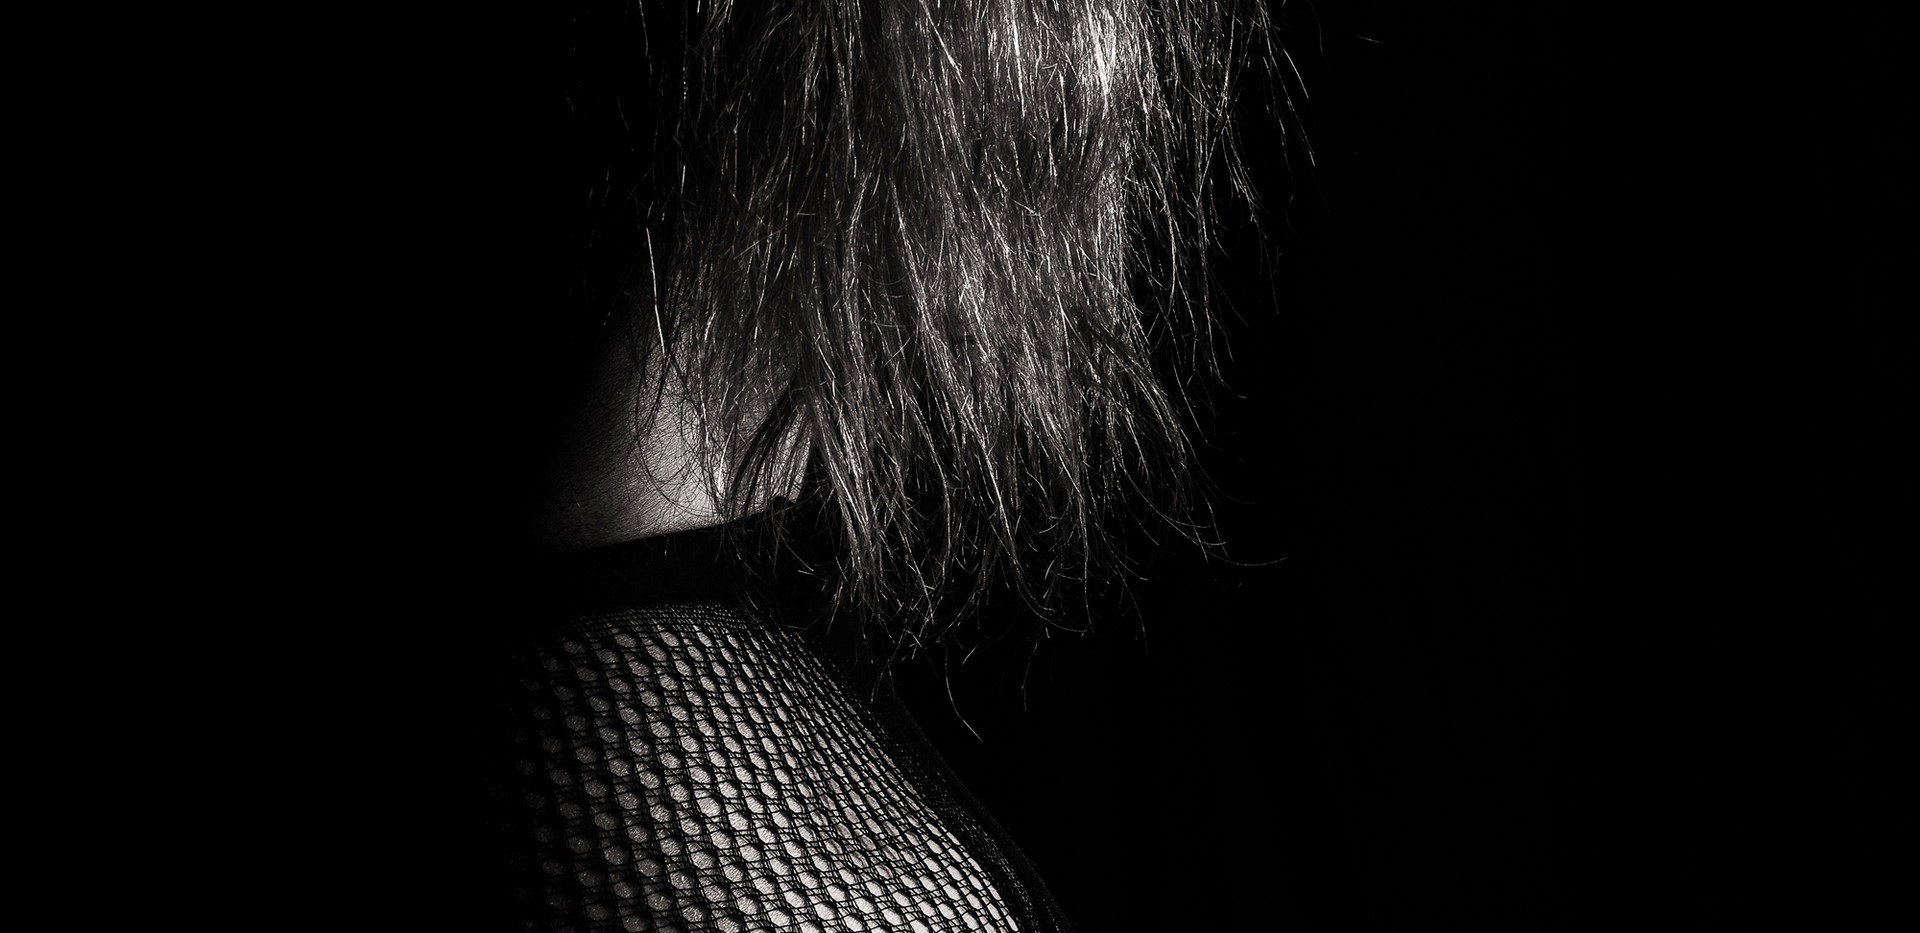 femme clair obscur